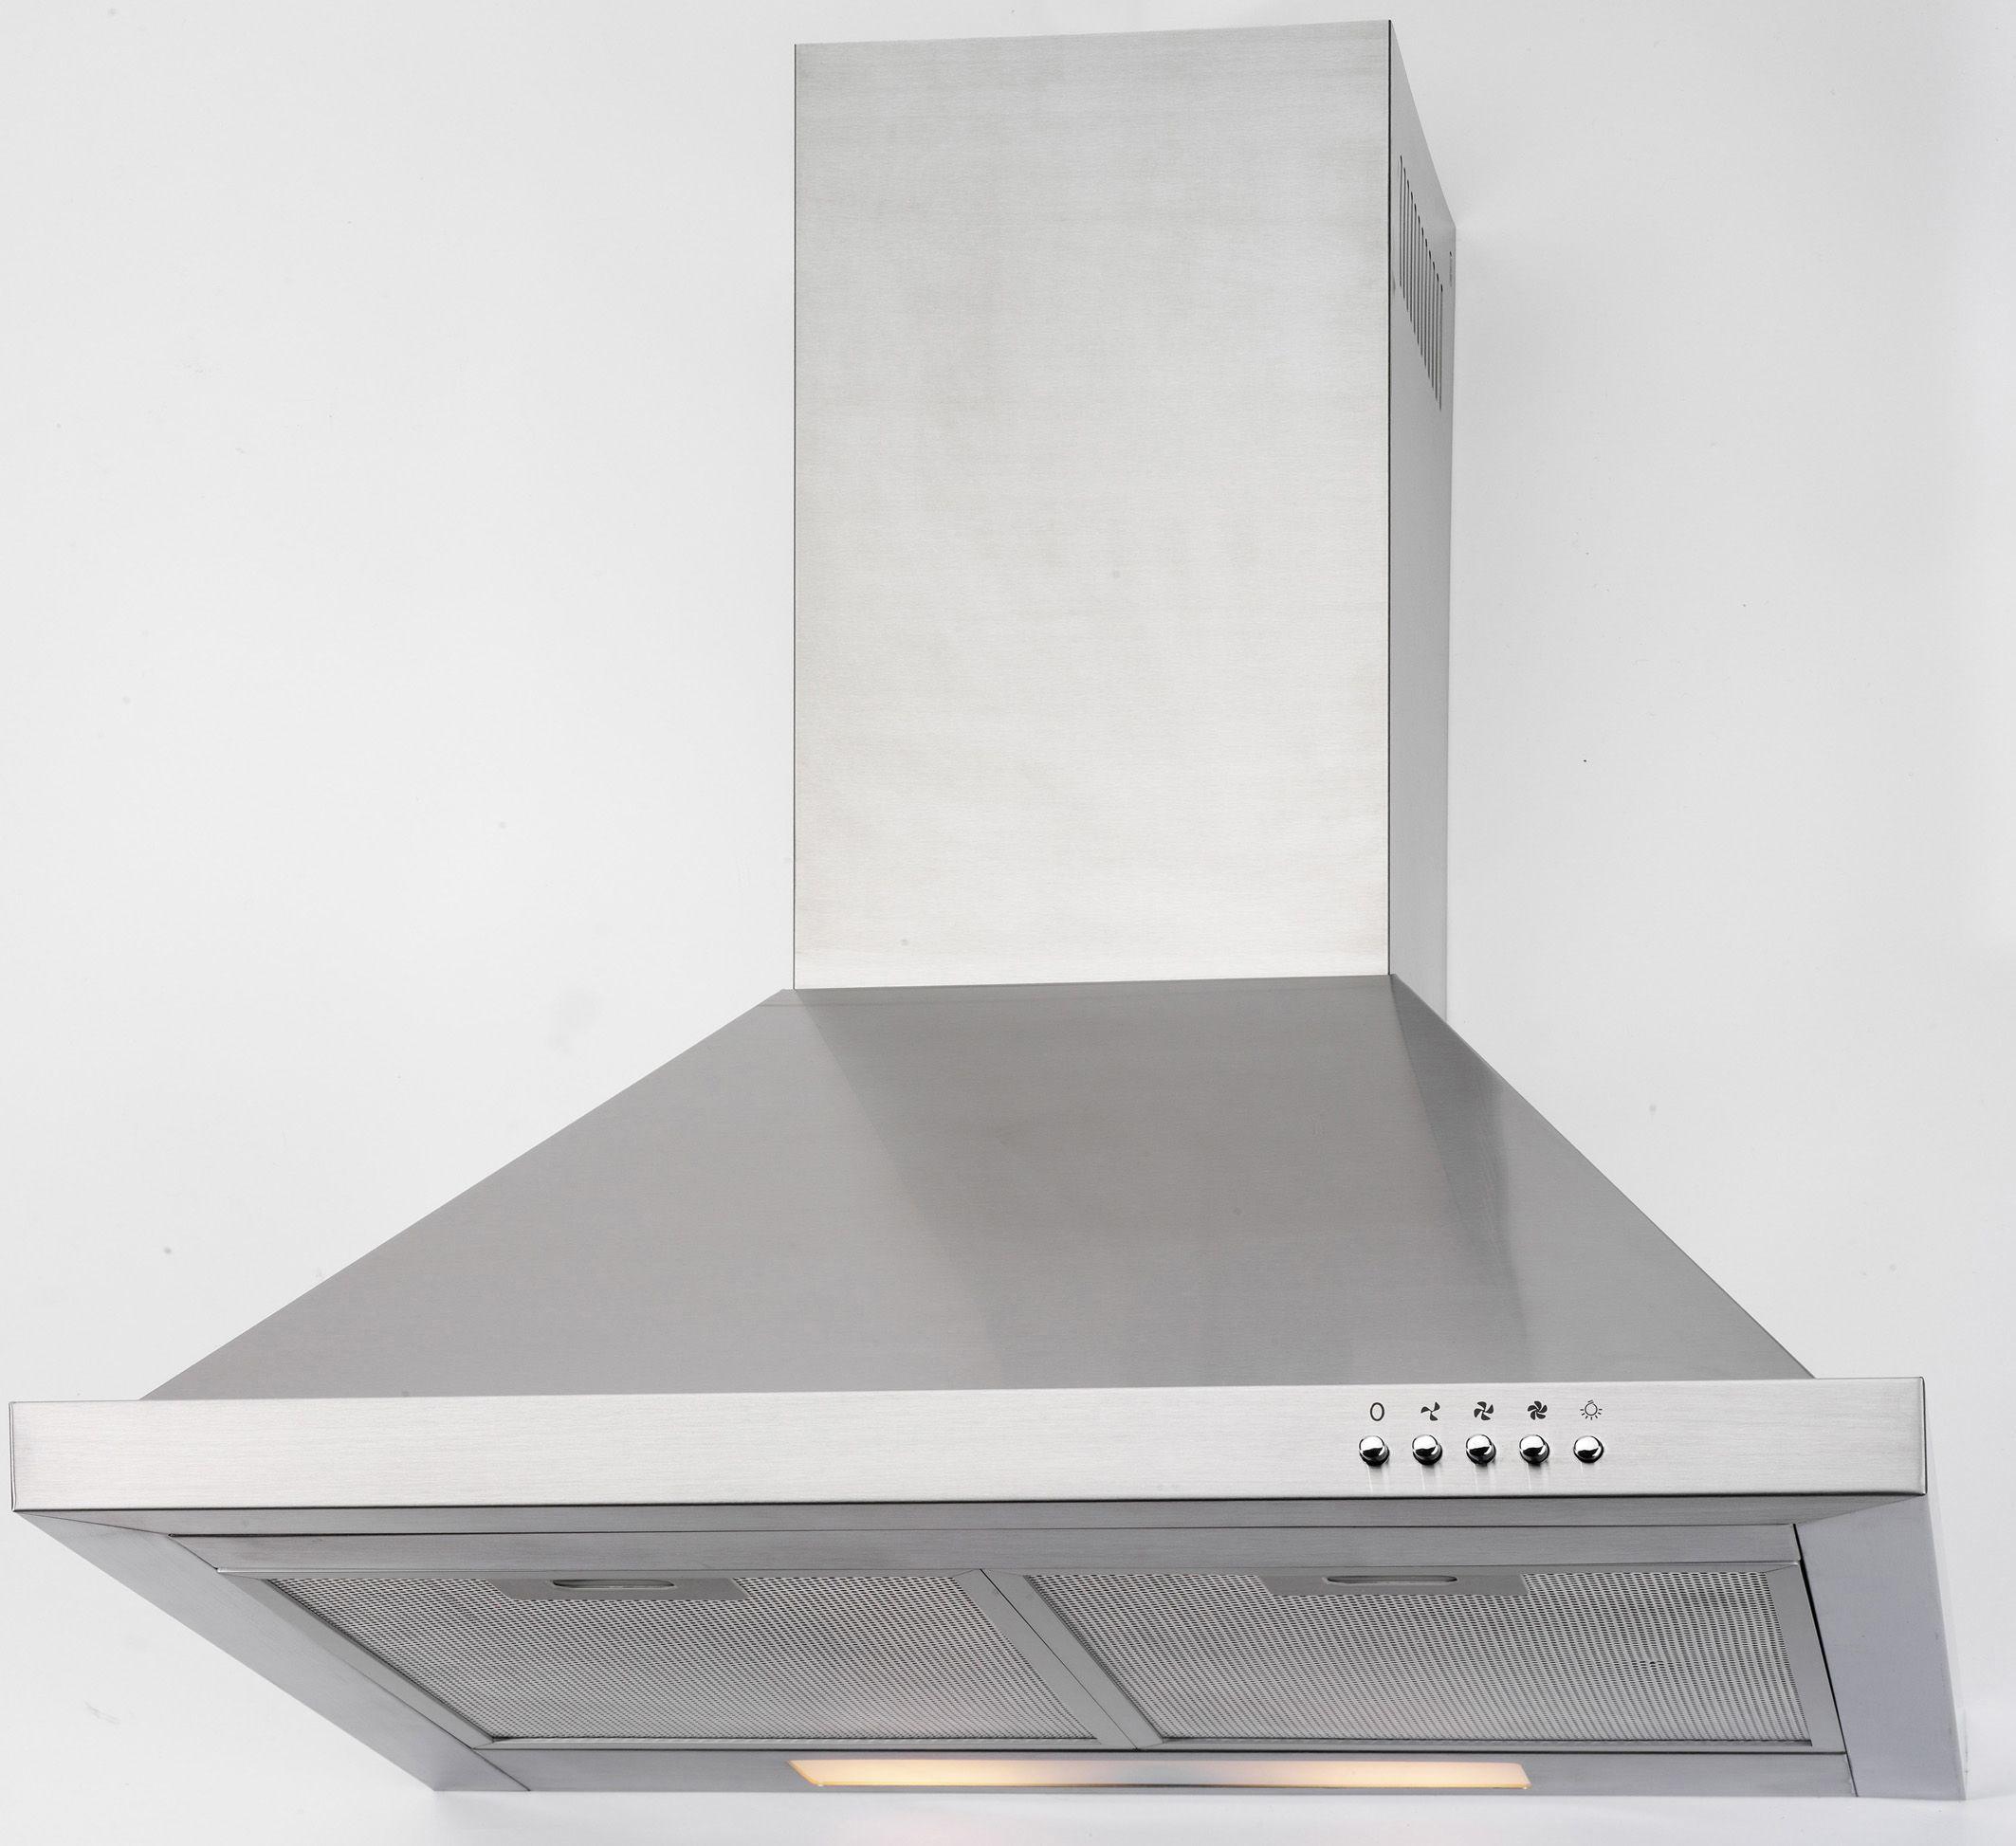 pkm 6090h wandhaube dunstabzugshaube inkl beleuchtung edelstahl 60 cm. Black Bedroom Furniture Sets. Home Design Ideas